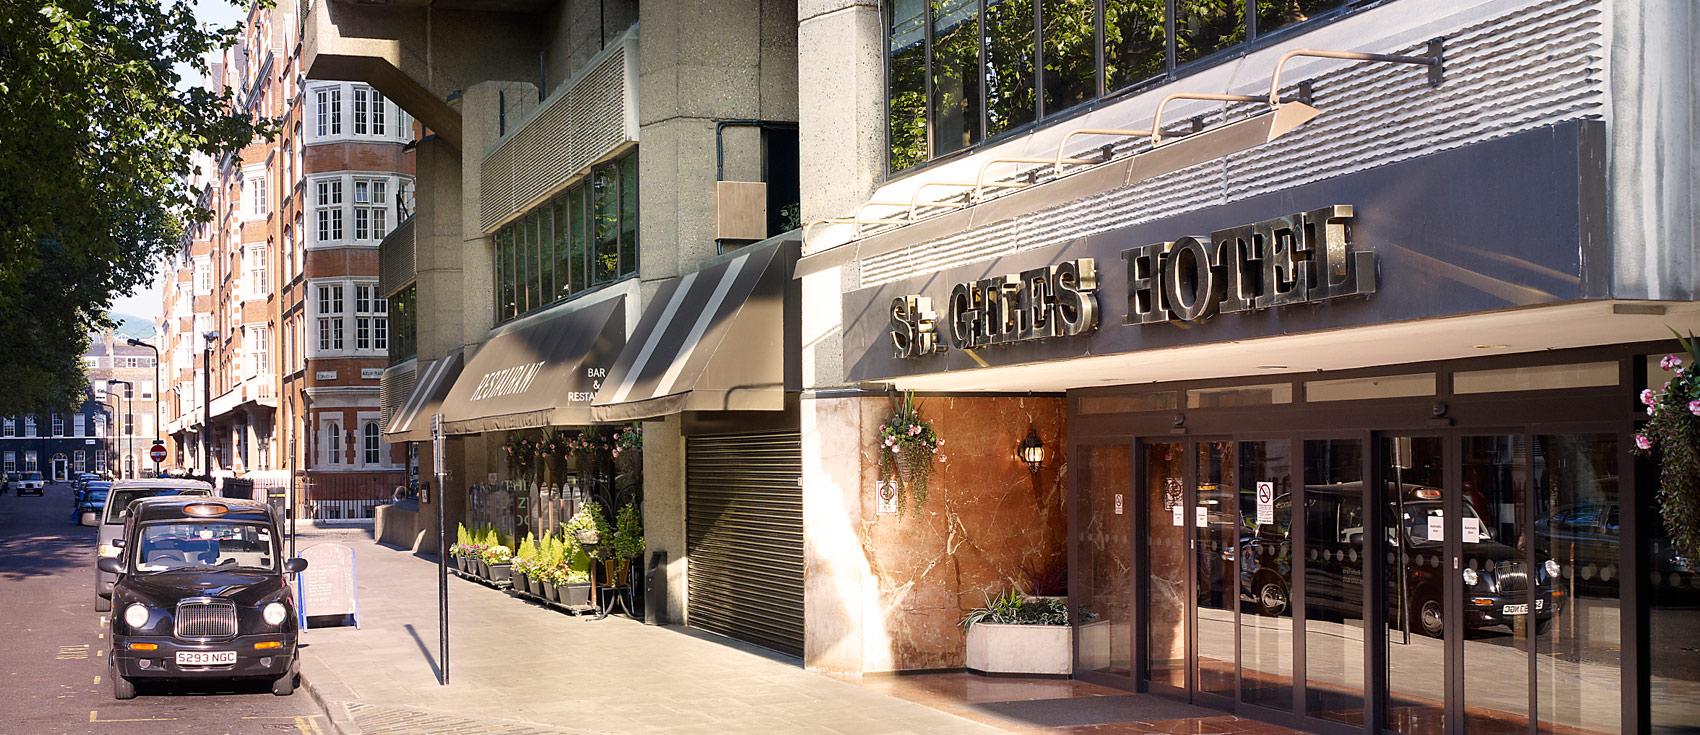 St. Giles Hotel, Tottenham Court Rd